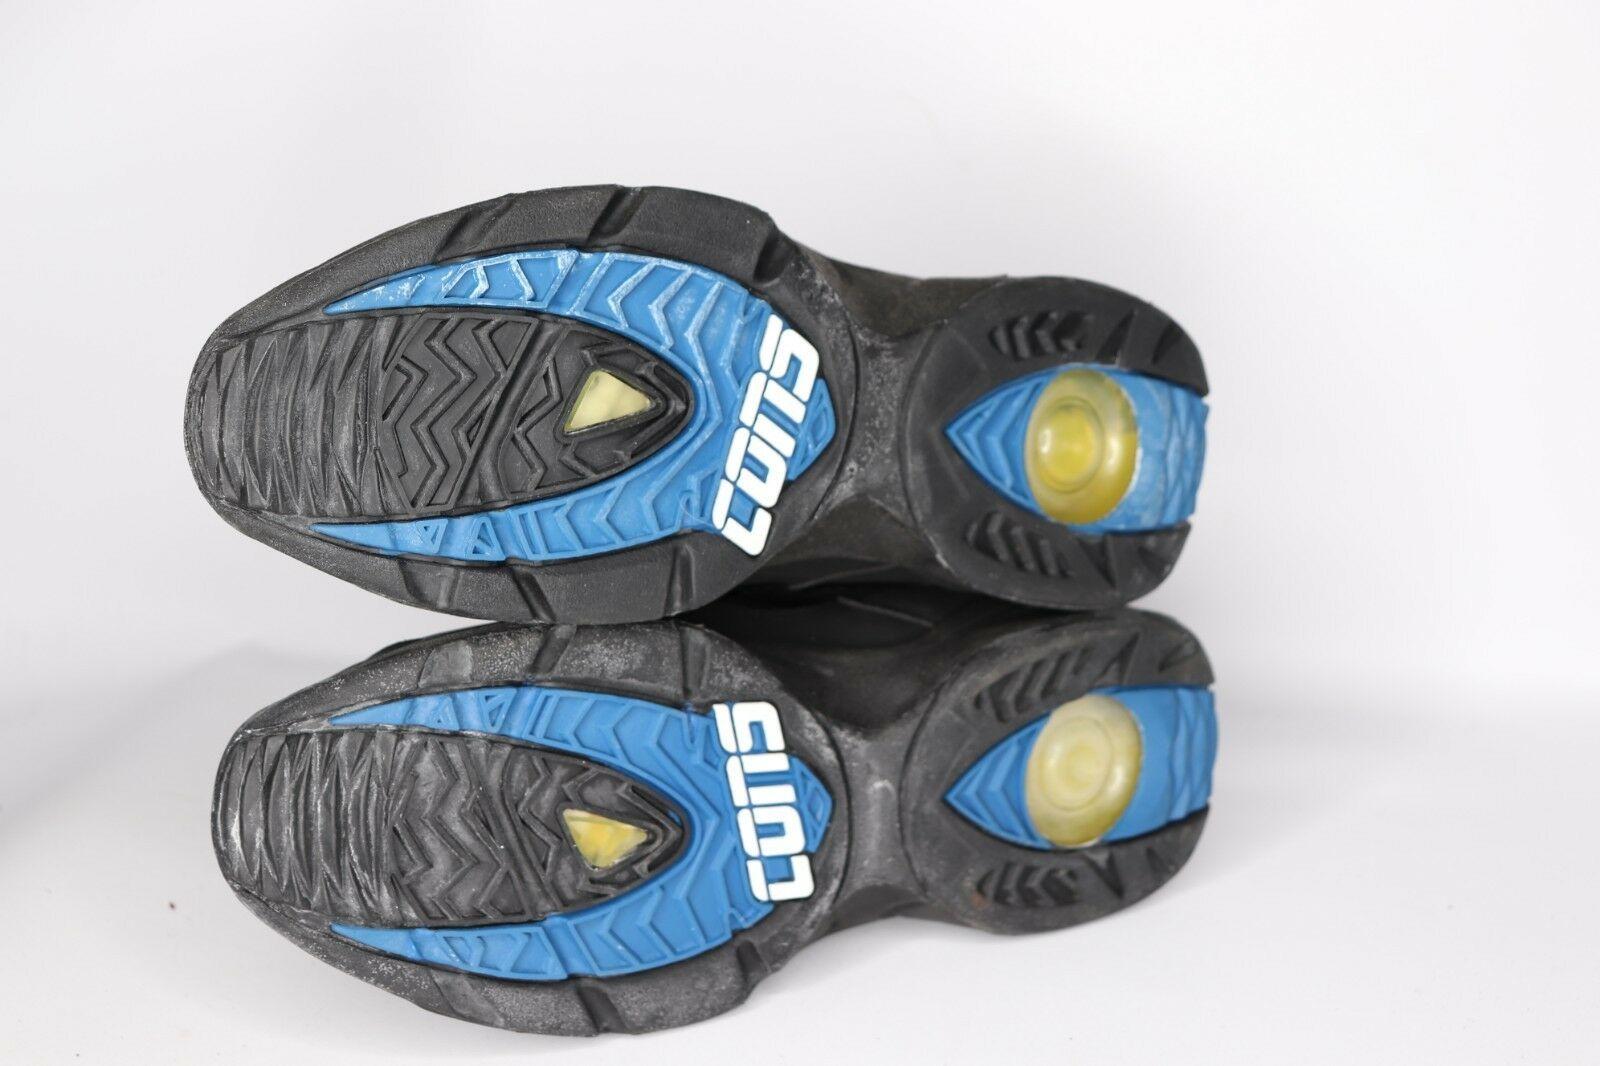 Vtg 90s Neu Converse Größe 10 Kevin Johnson Run n Slam Mid Cons React Schuhe